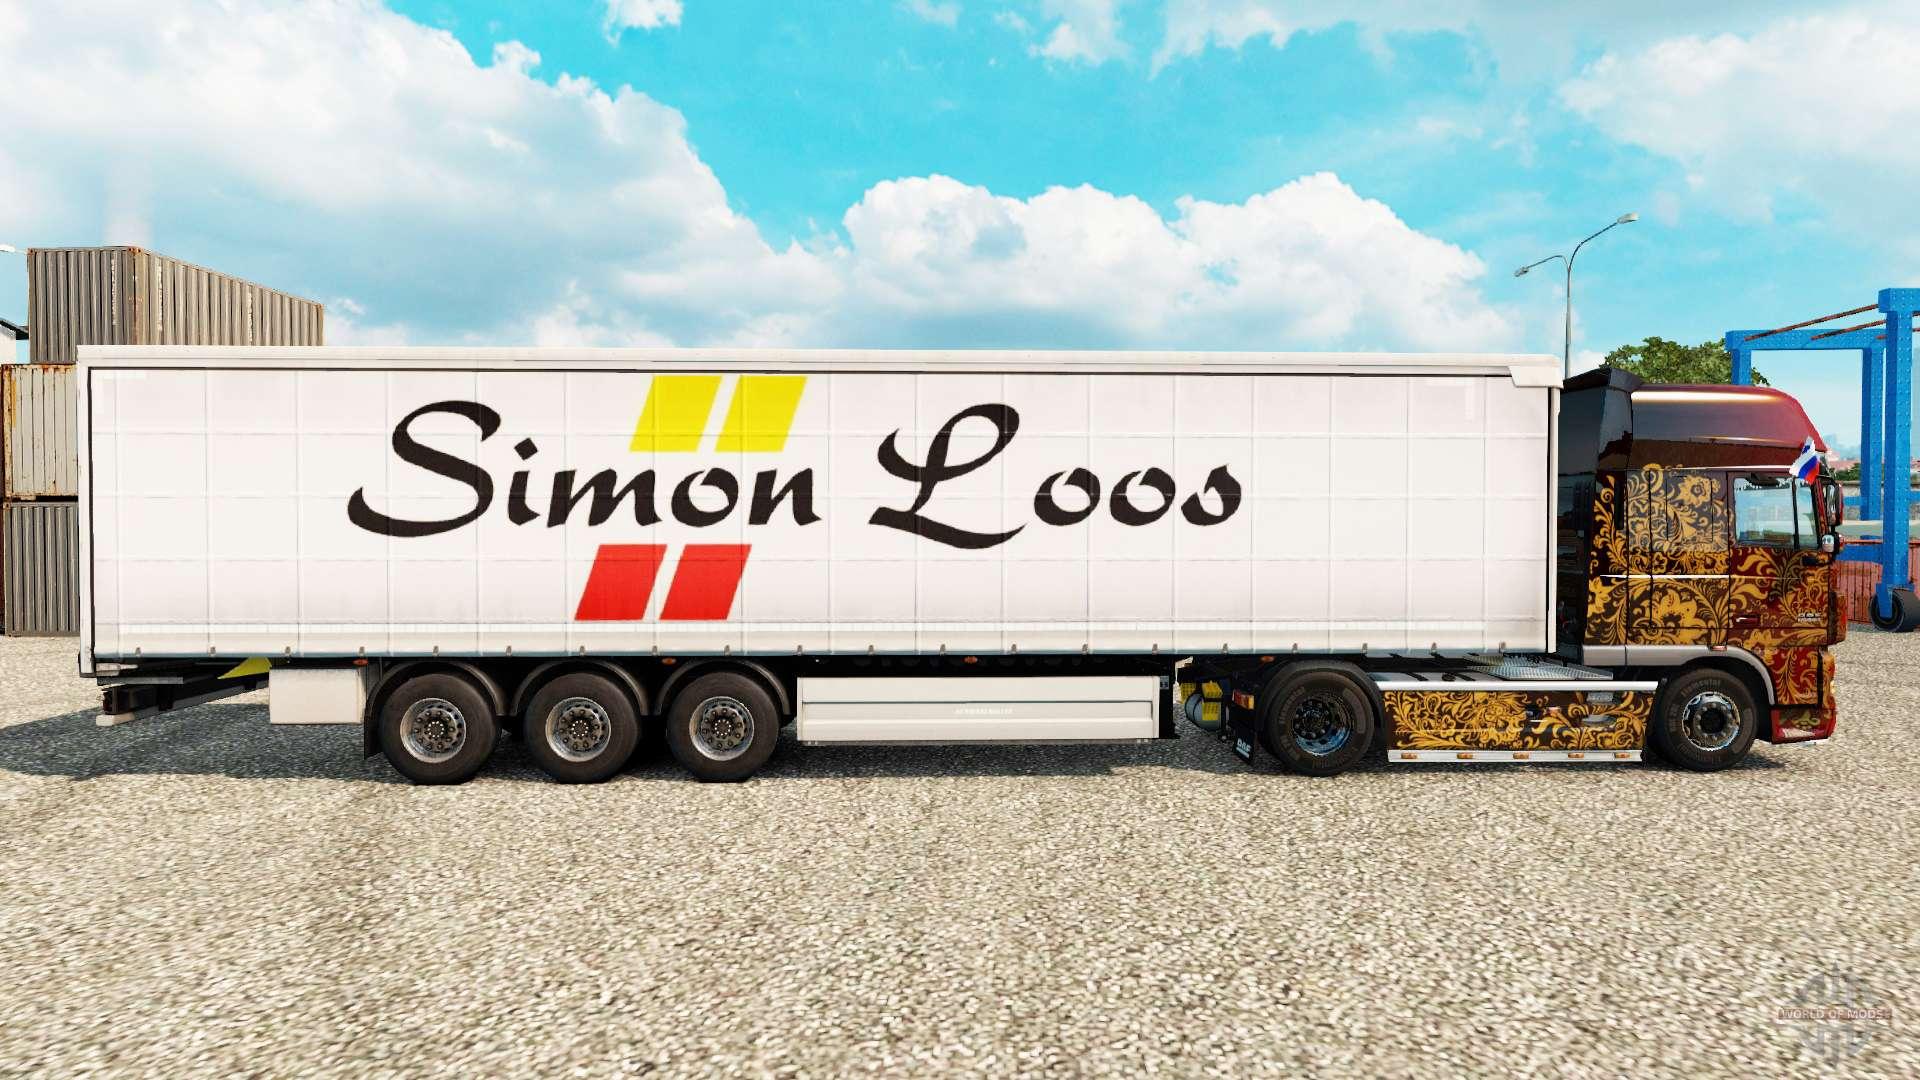 Euro Truck Simulator 2 Mods   ETS2 Mods - Modhub.us